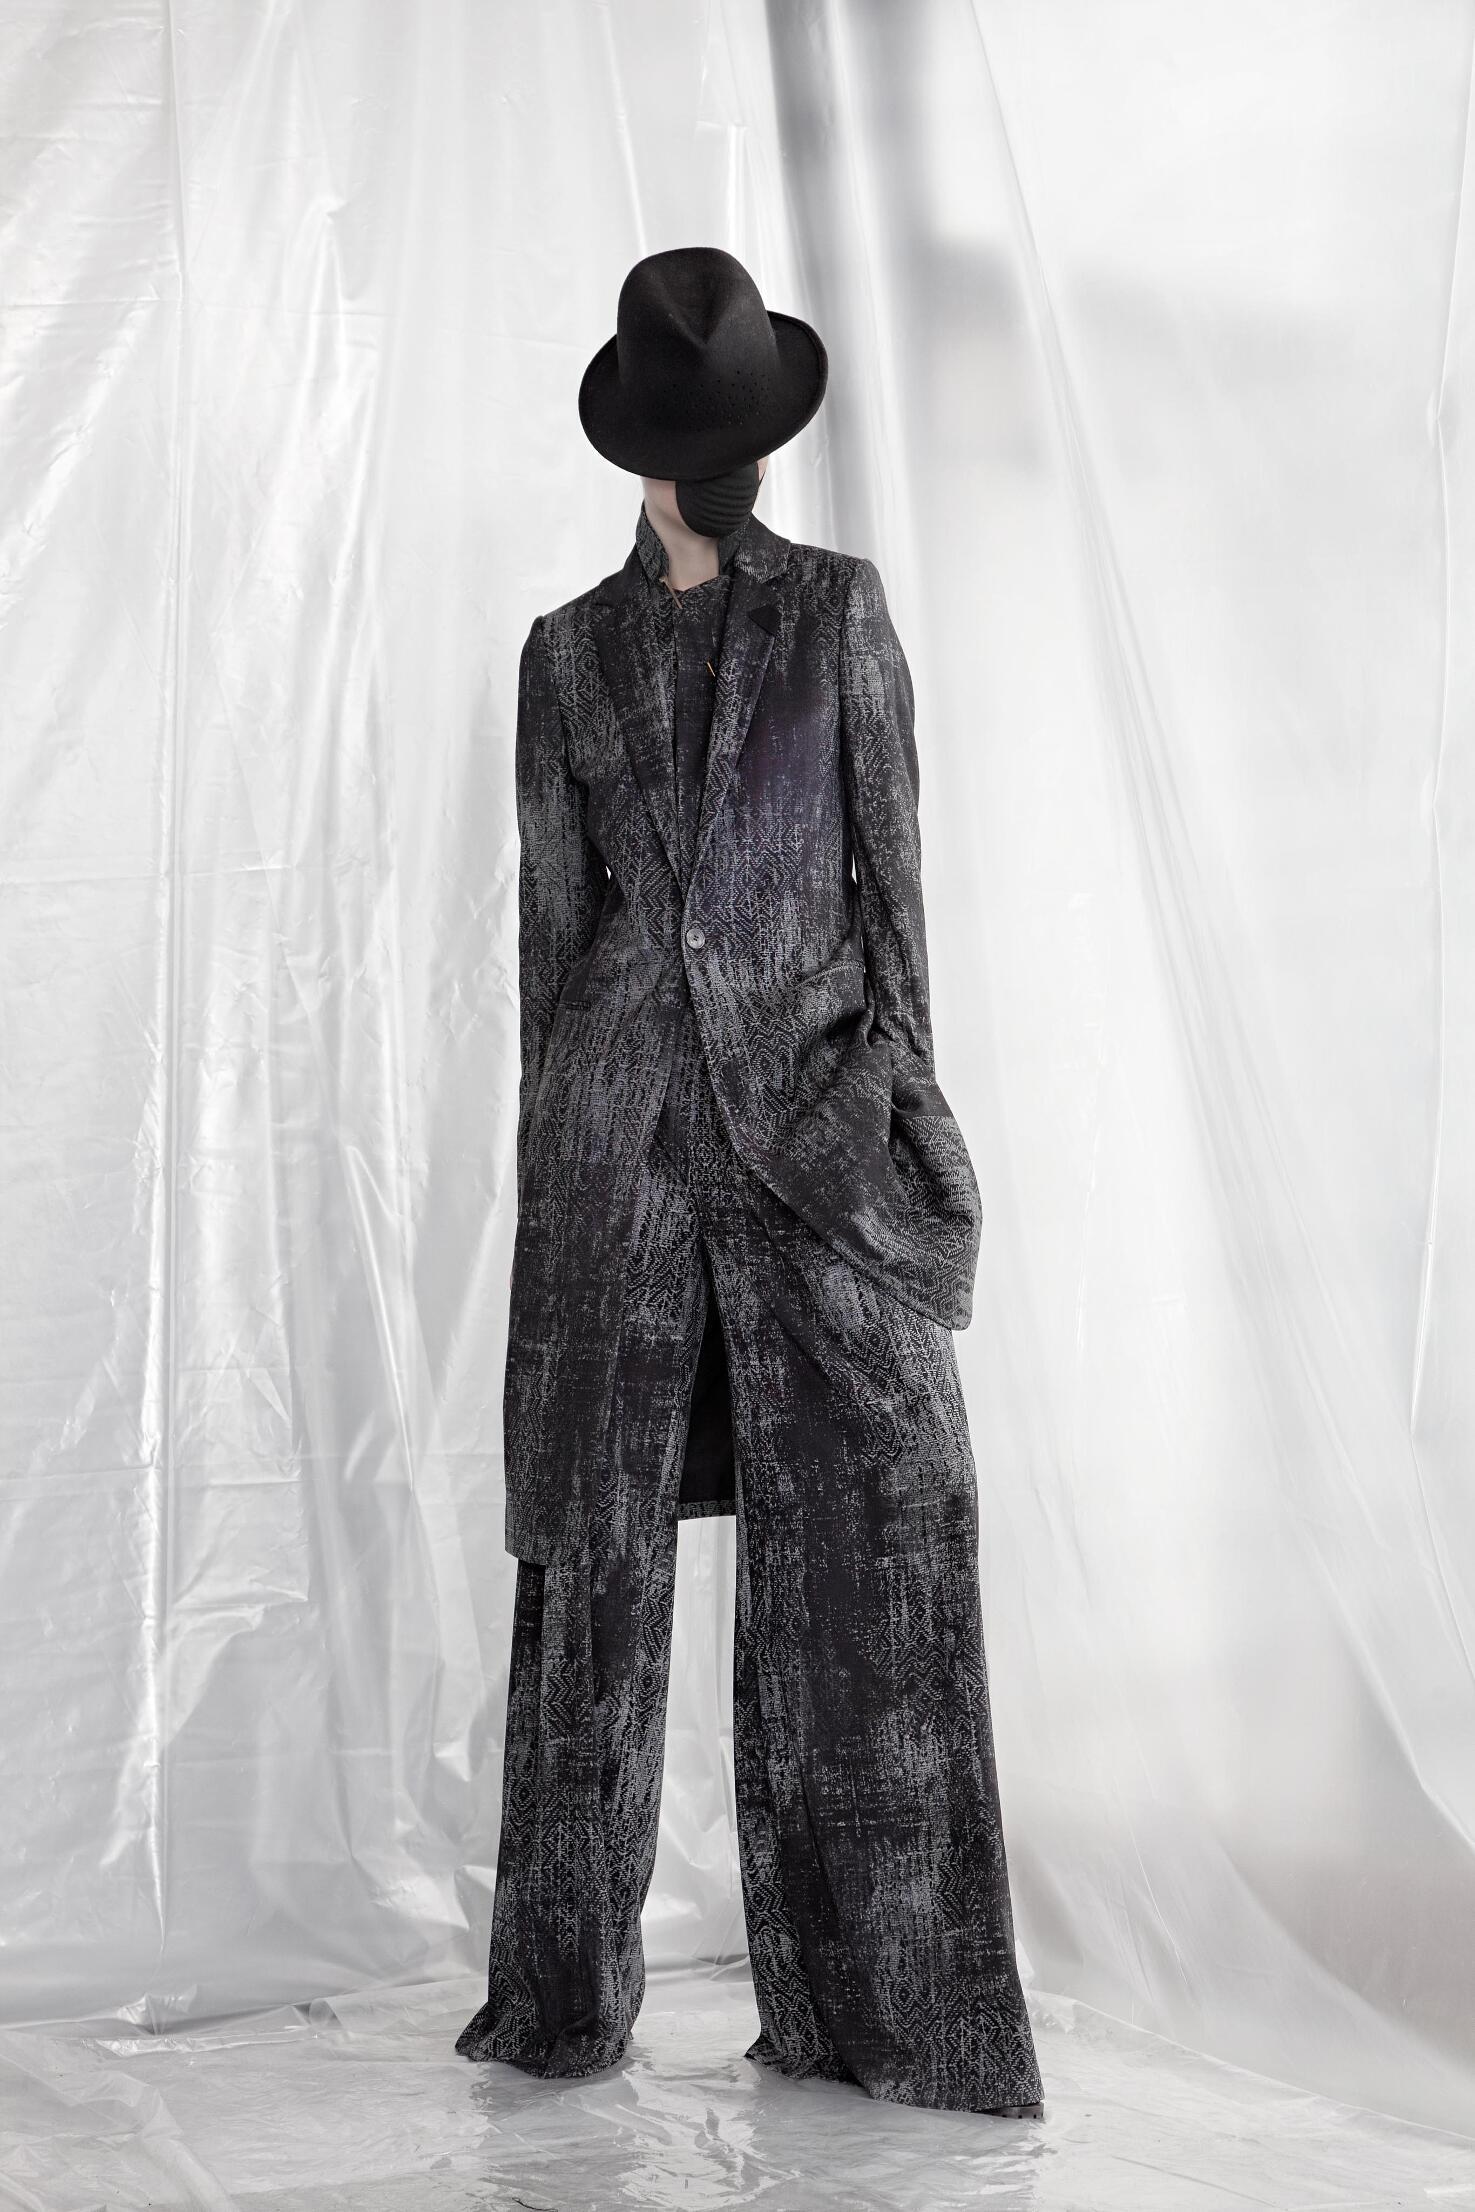 Catwalk A.F. Vandevorst Collection Fashion Show Winter 2015